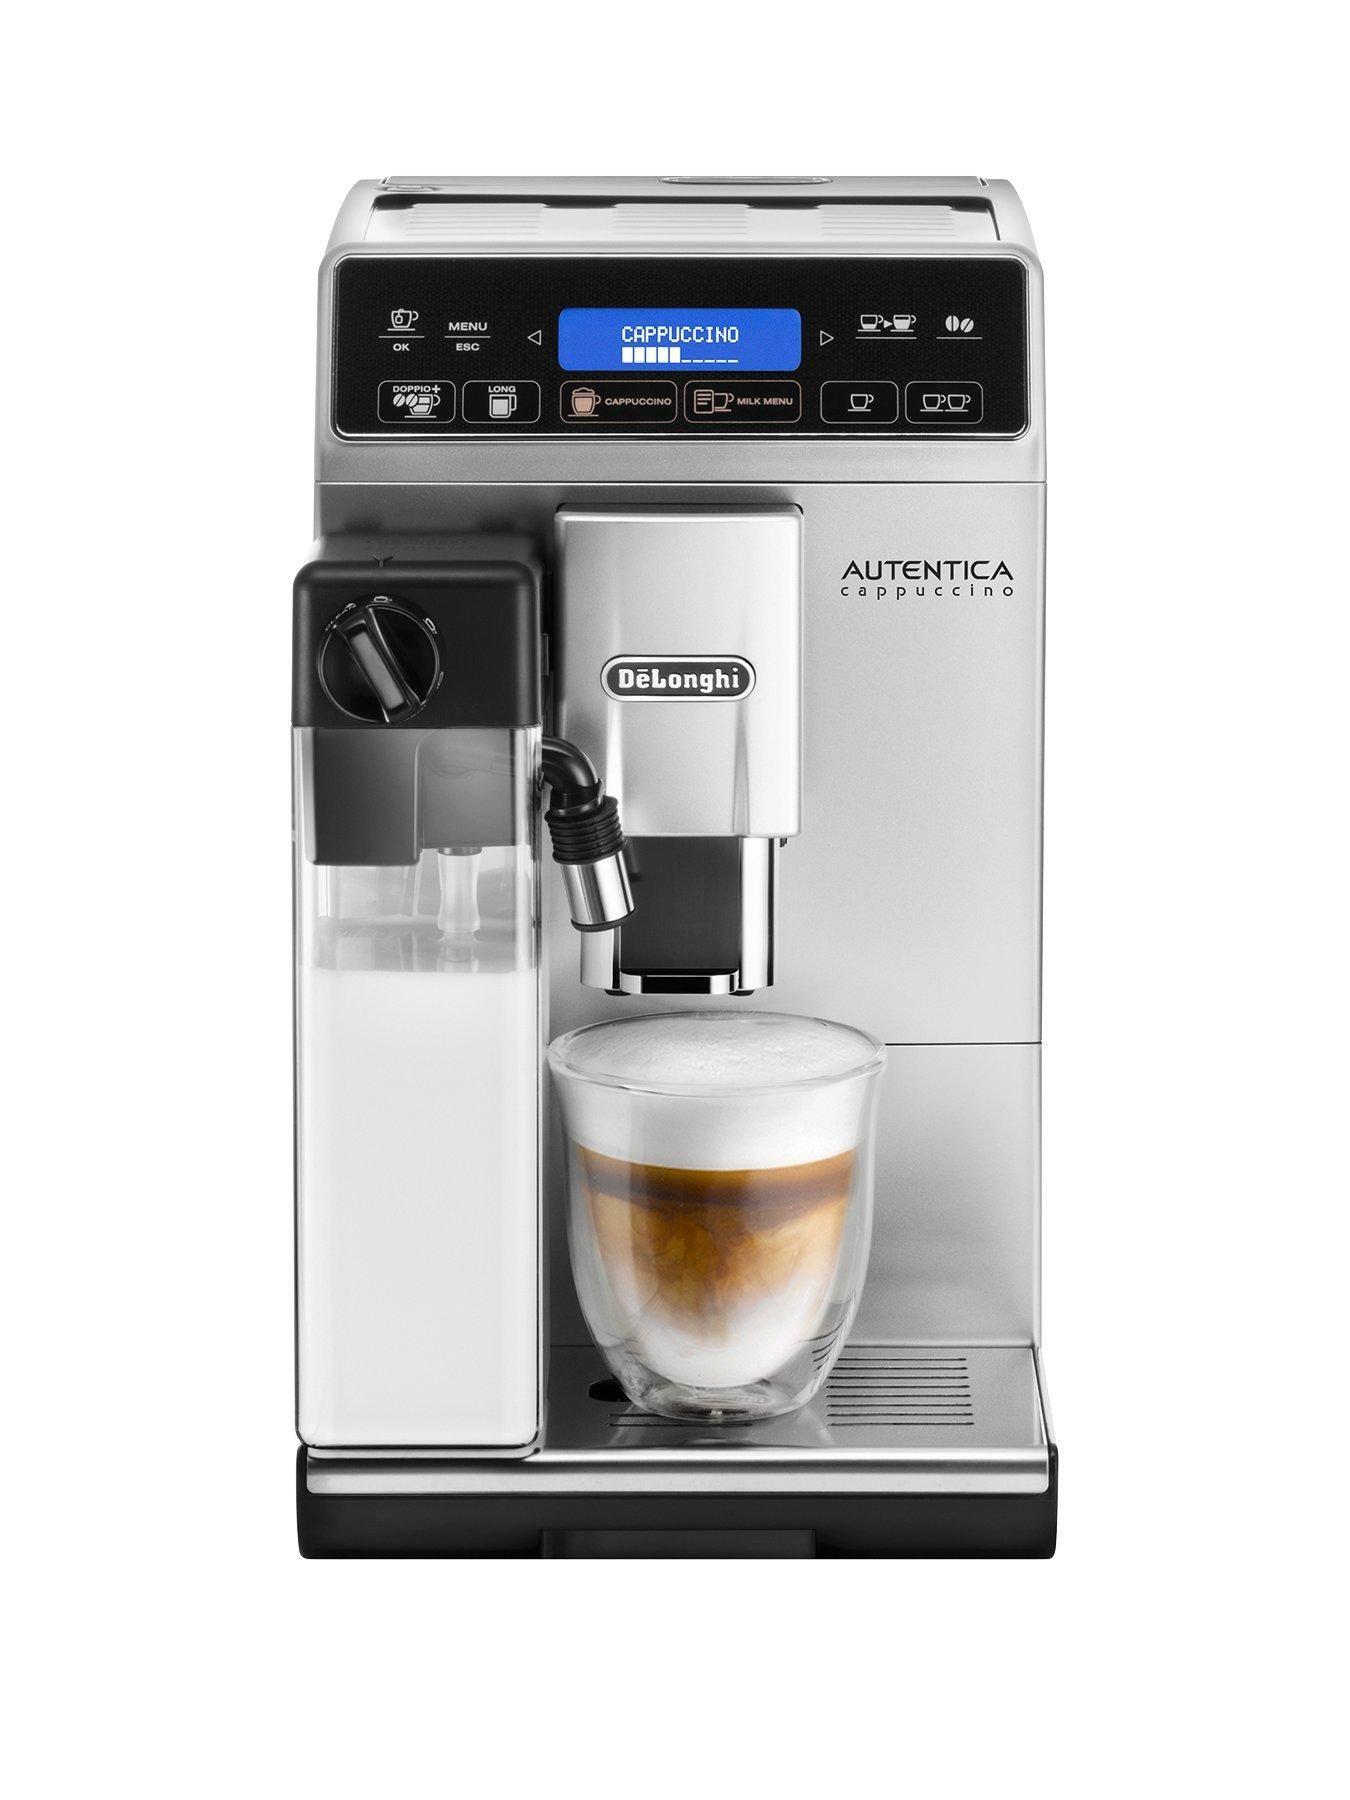 Autentica Etam29 660 Sb Bean To Cup Coffee Machine Juracoffeemachine With Images Coffee Machine Coffee And Espresso Maker Coffee Making Machine